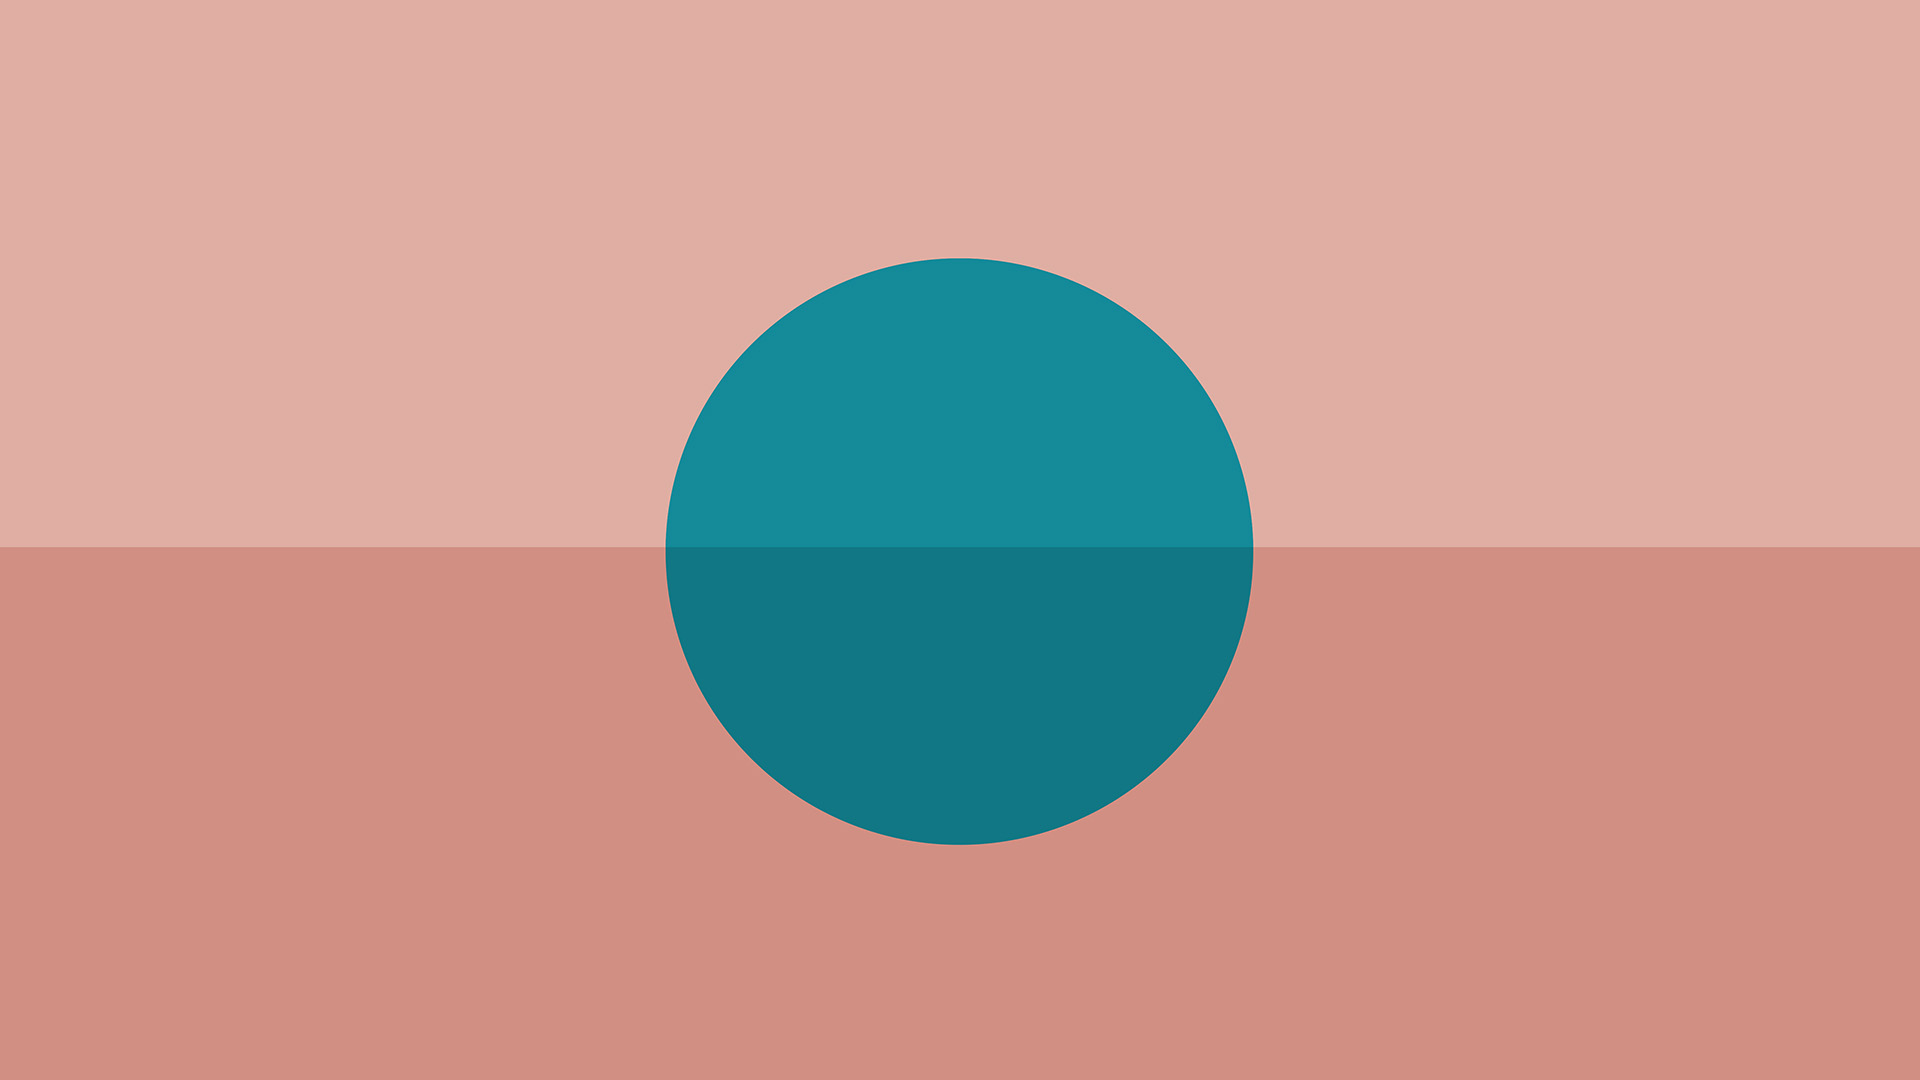 wallpaper for desktop, laptop | ar41-minimal-tycho-art-sun ...